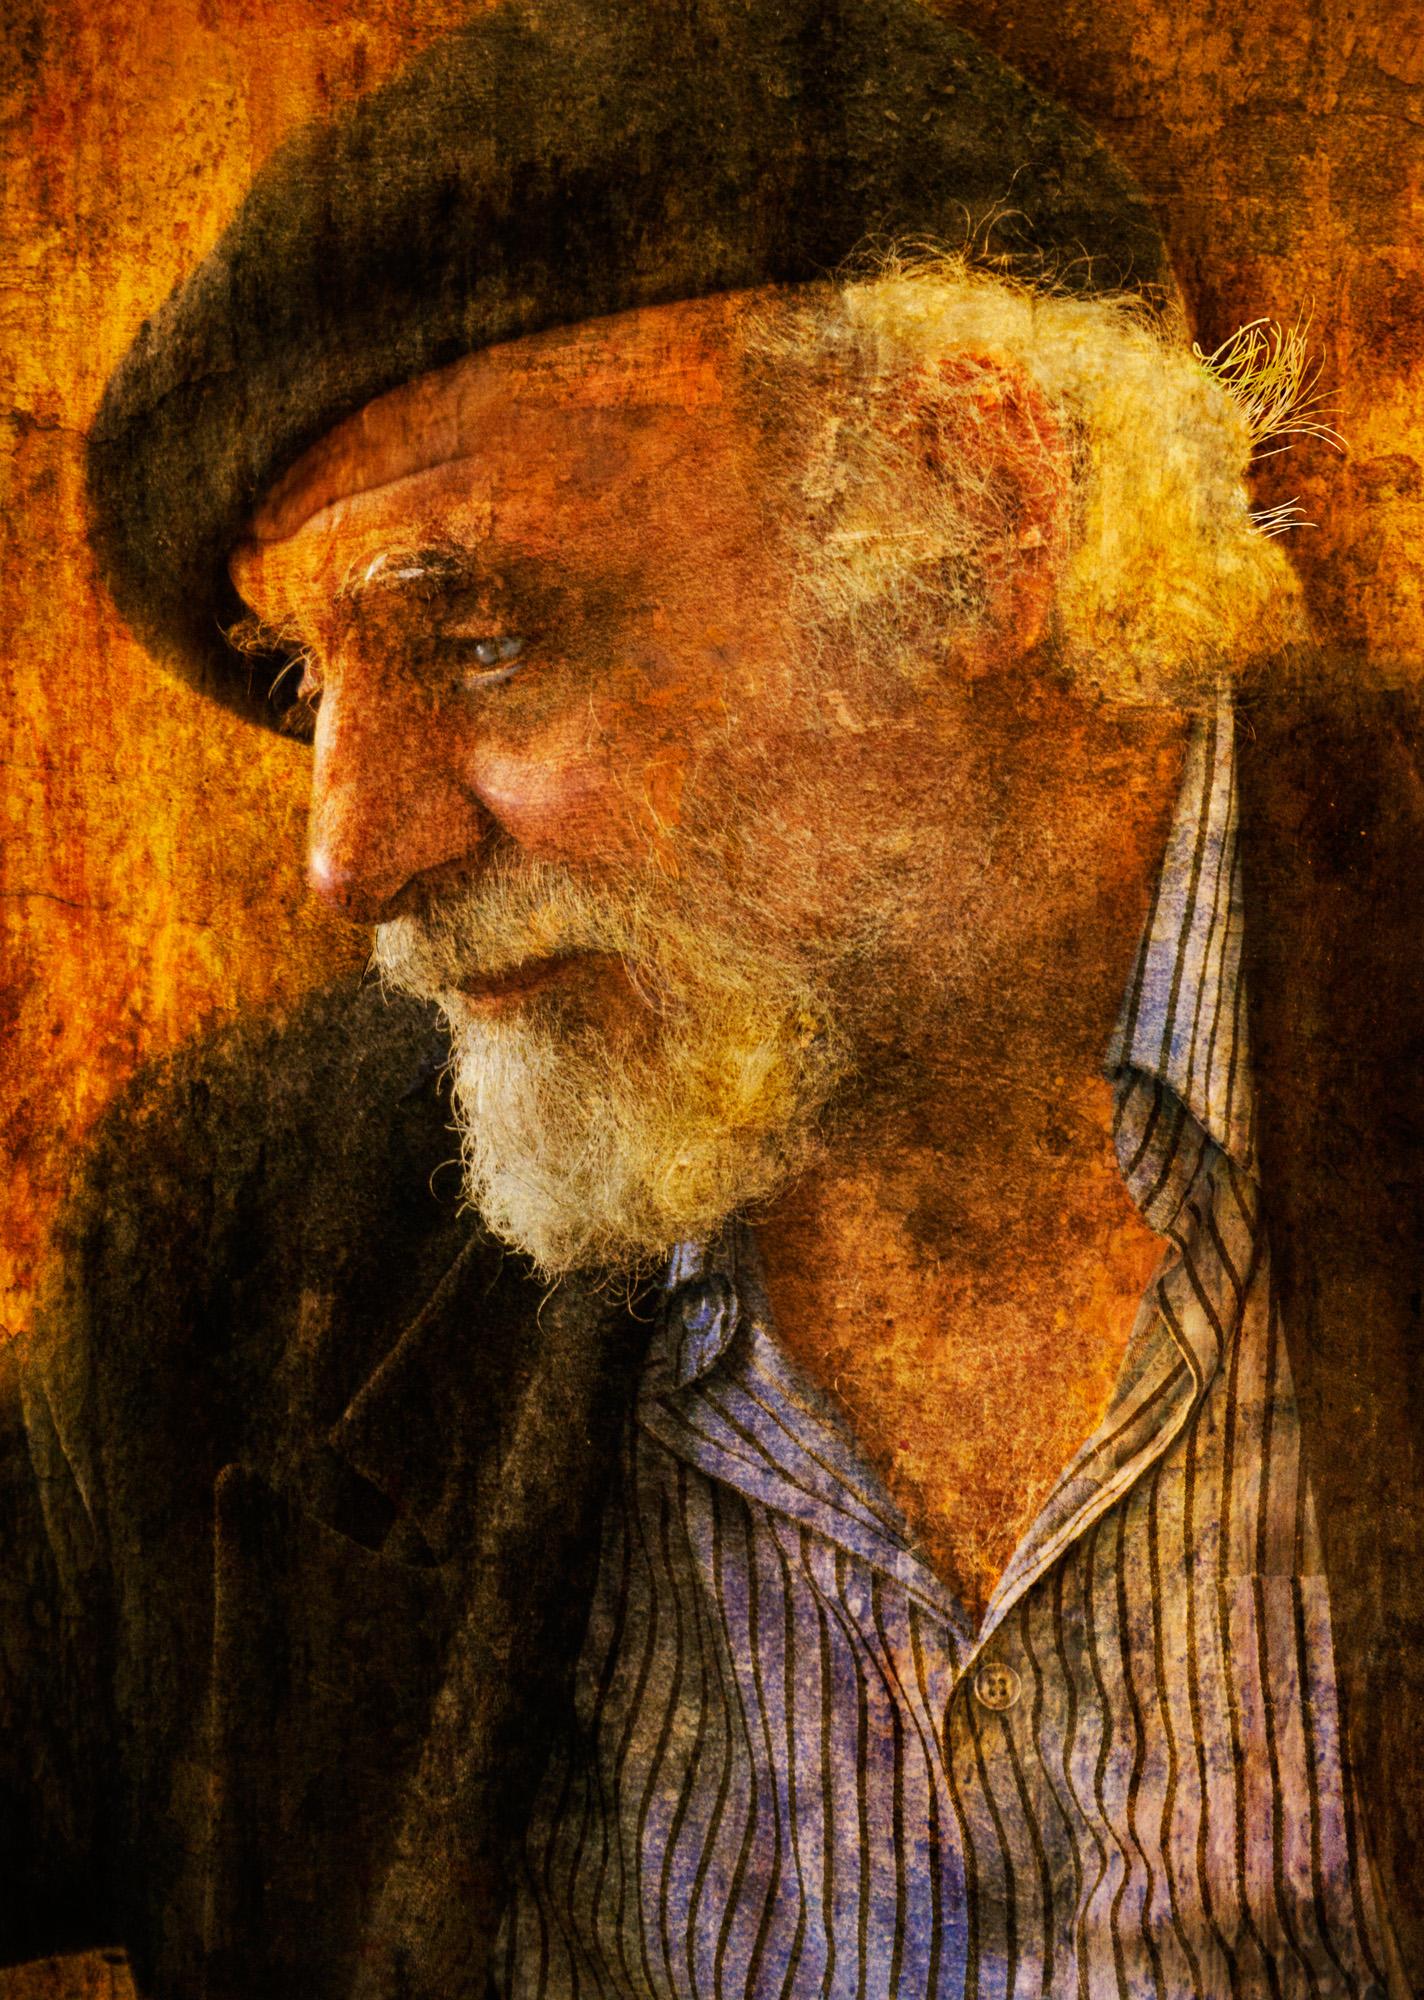 Bob Coates - P1030869_artist_gorghy_sacra_cour_2a.jpg